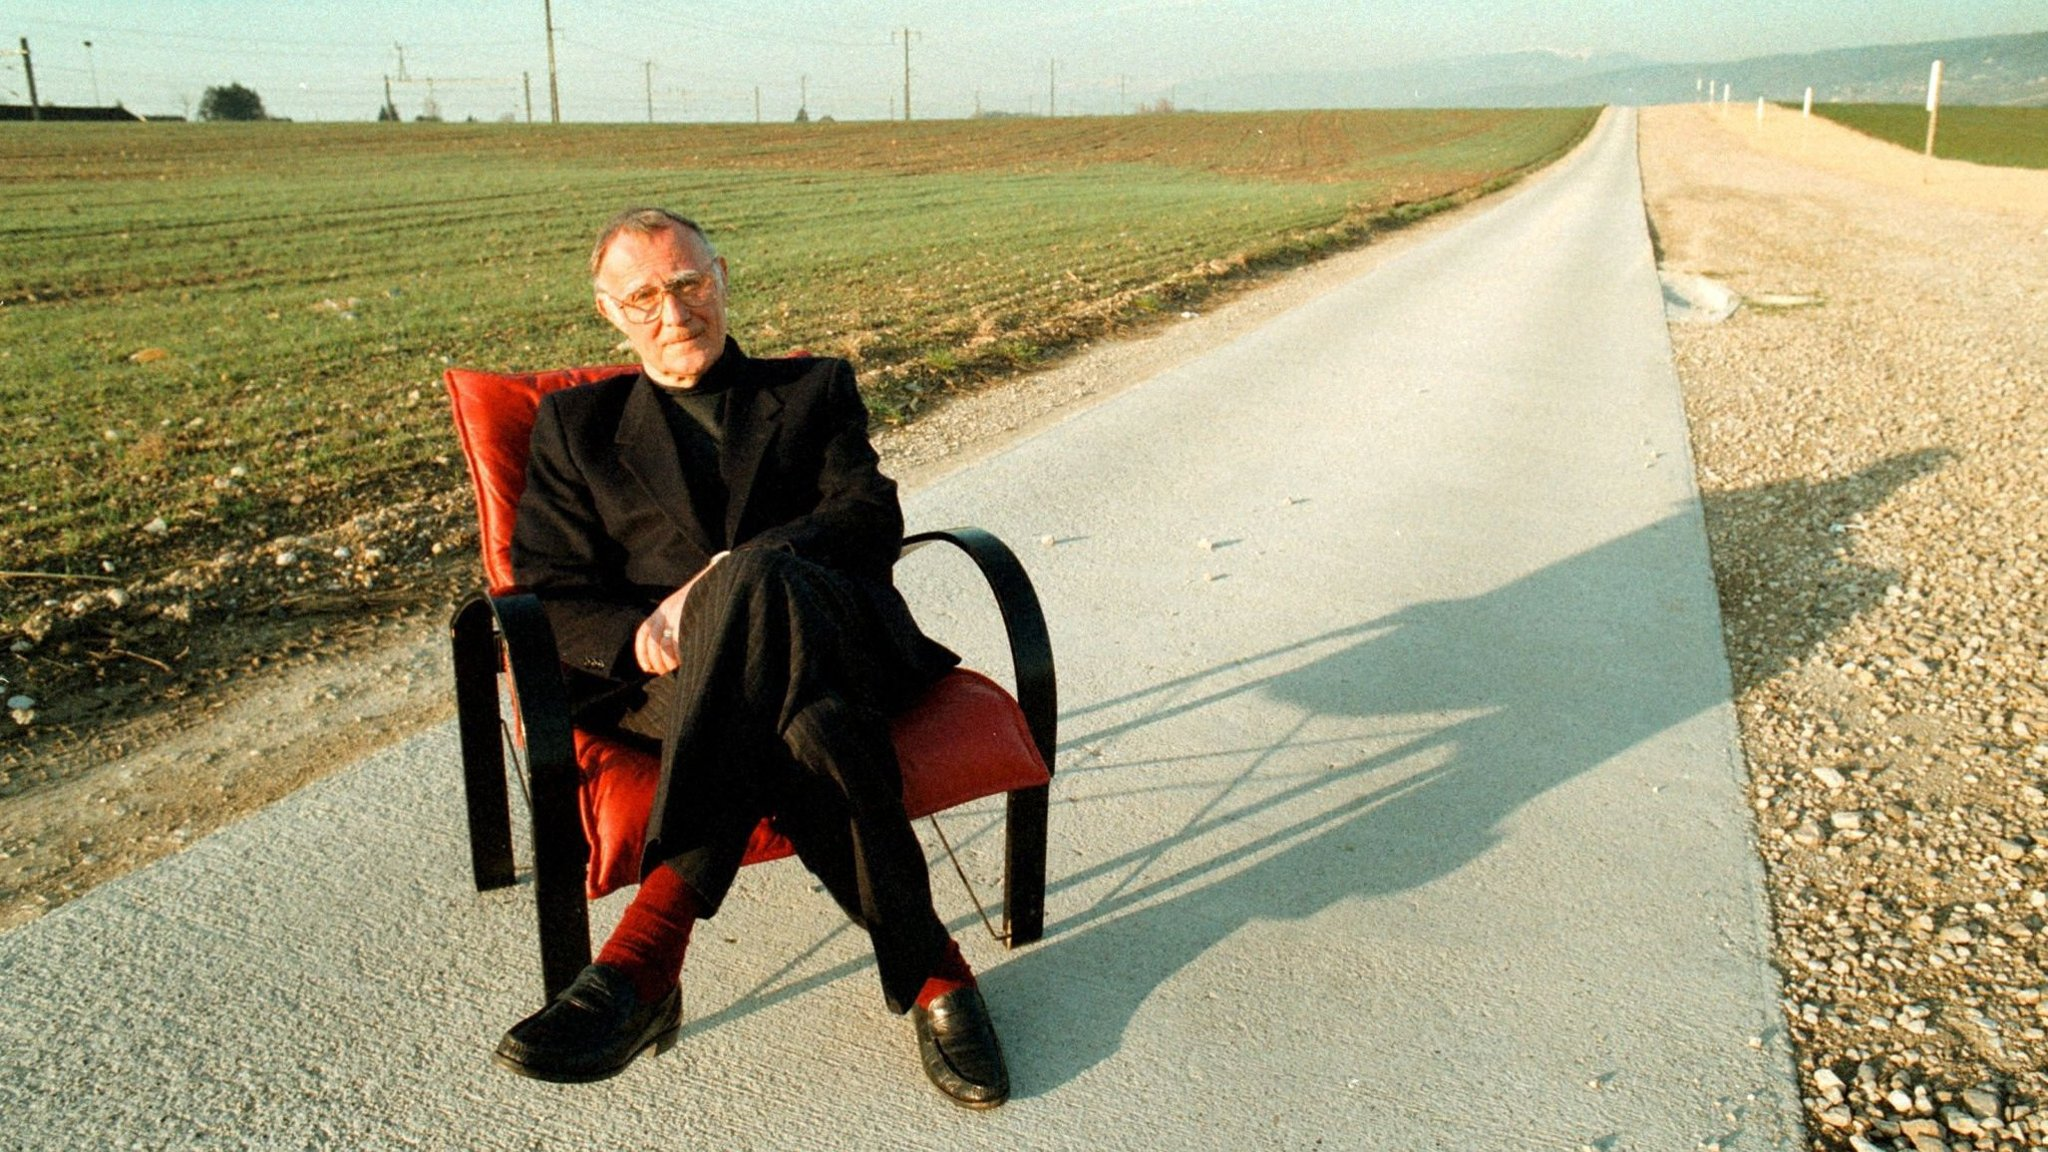 Ingvar Kamprad, 1926-2018, Ikea founder